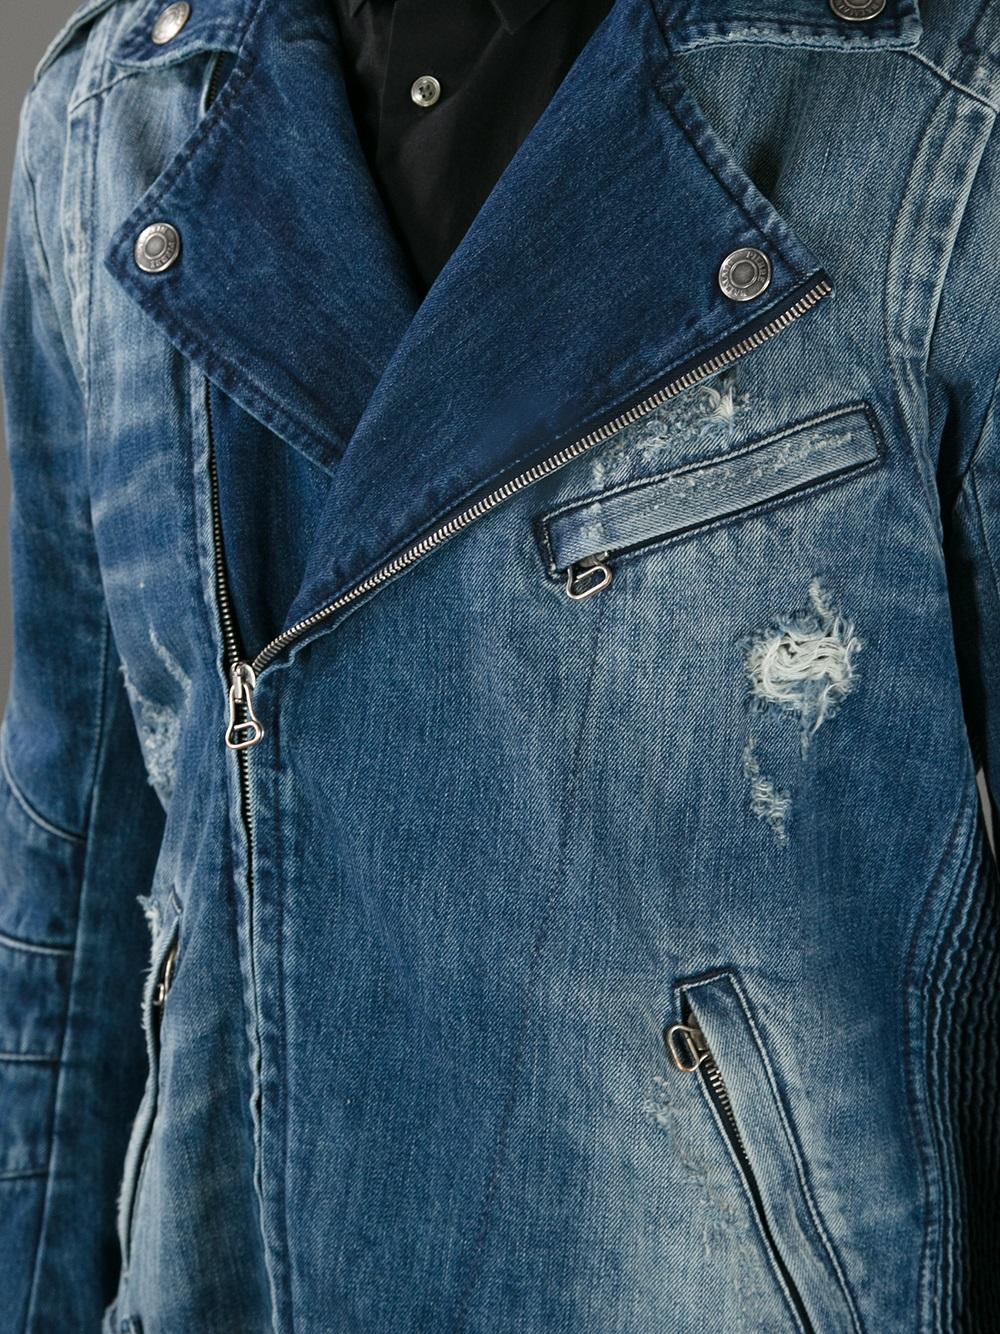 Balmain Denim Biker Jacket In Blue For Men Lyst